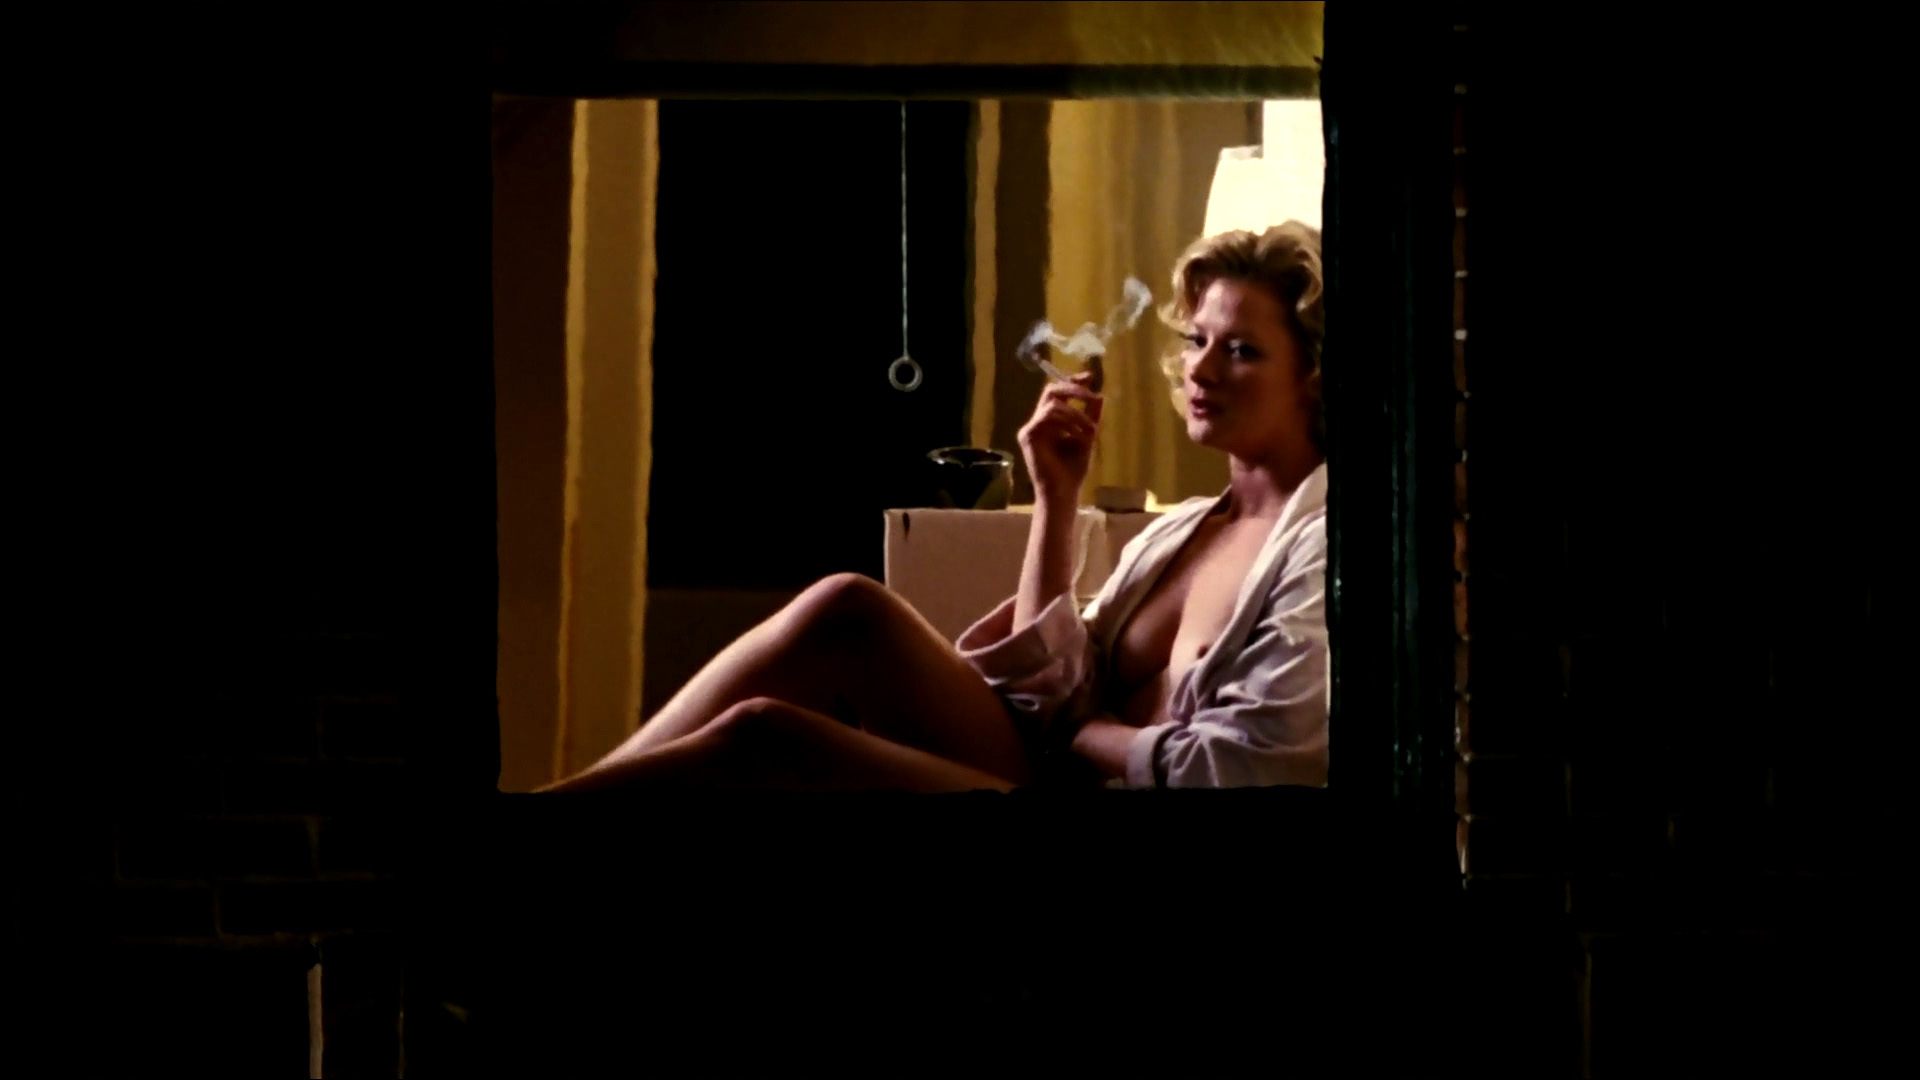 Gretchen Mol - An American Affair HD 1080p 01.jpg